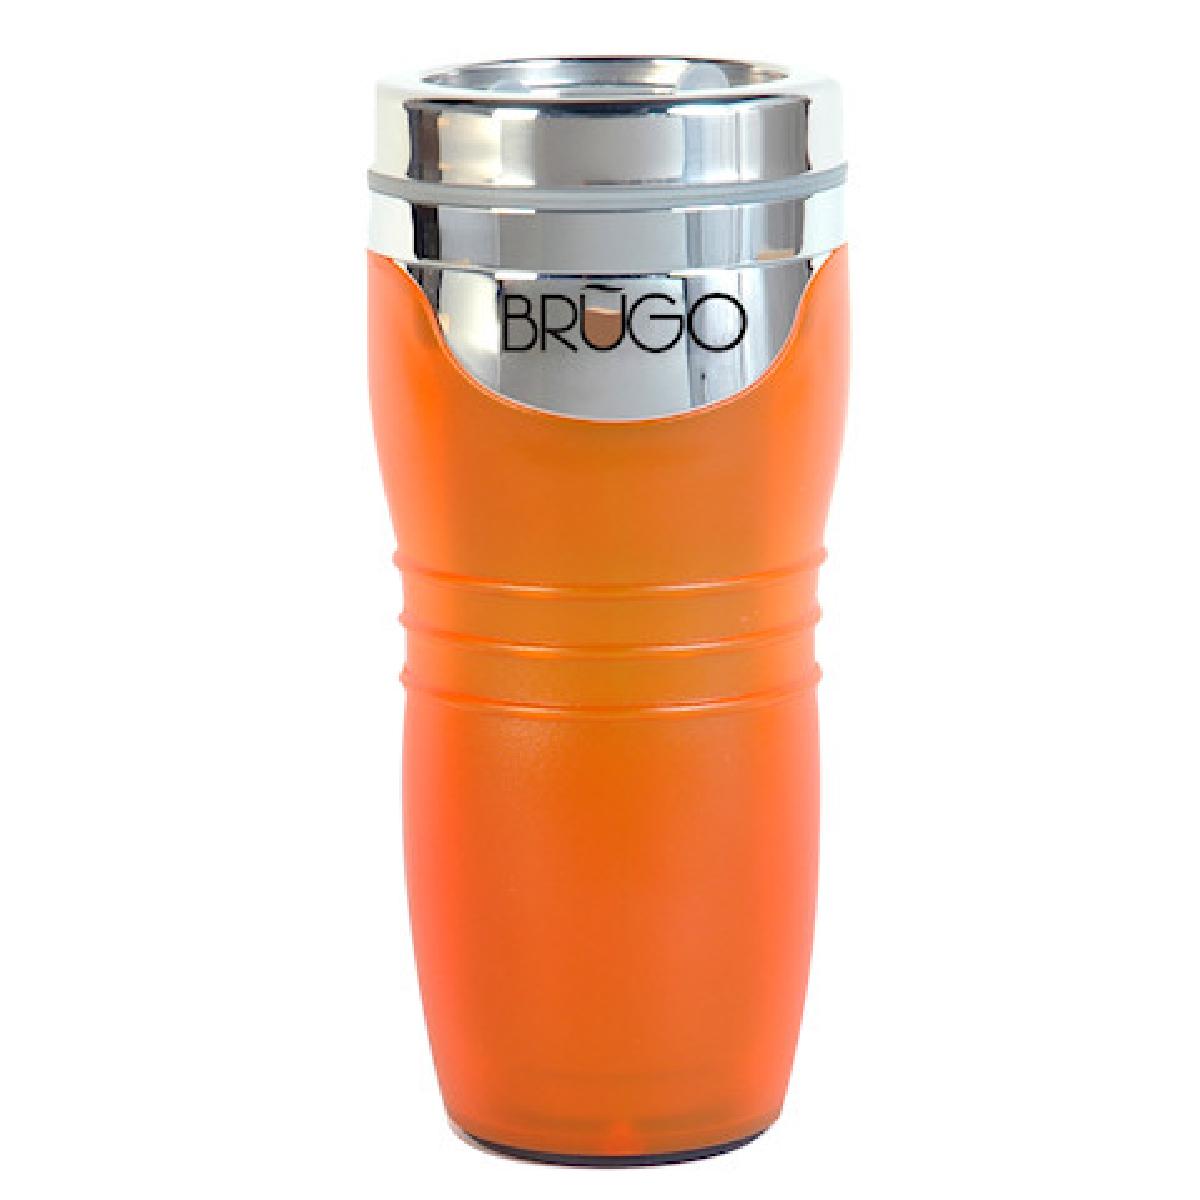 Brugo : un mug révolutionnaire